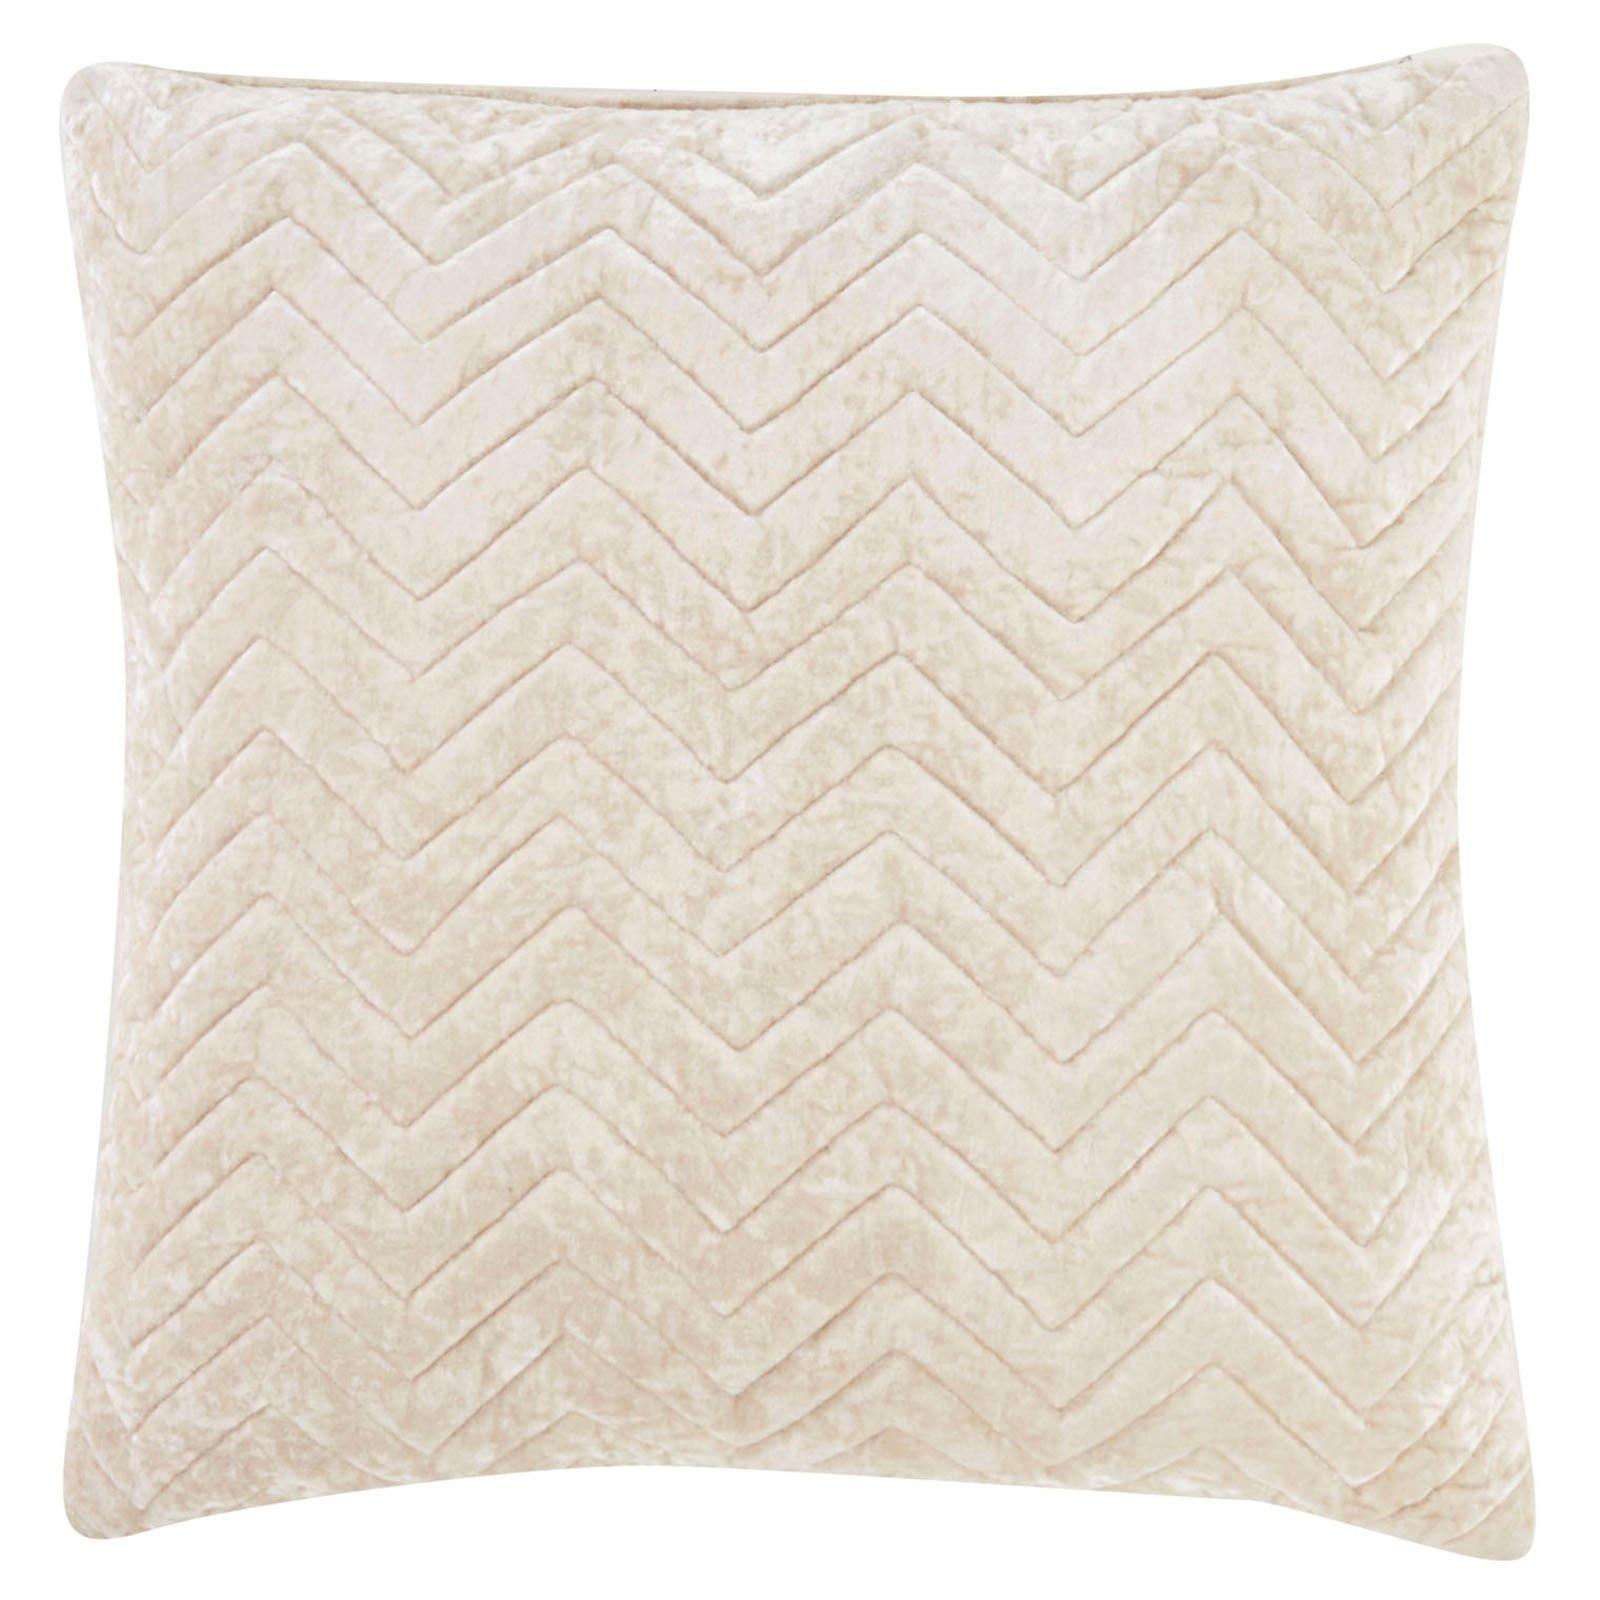 Nikki Chu by Jaipur Quilted Chevron Viscose Decorative Pillow - Beige